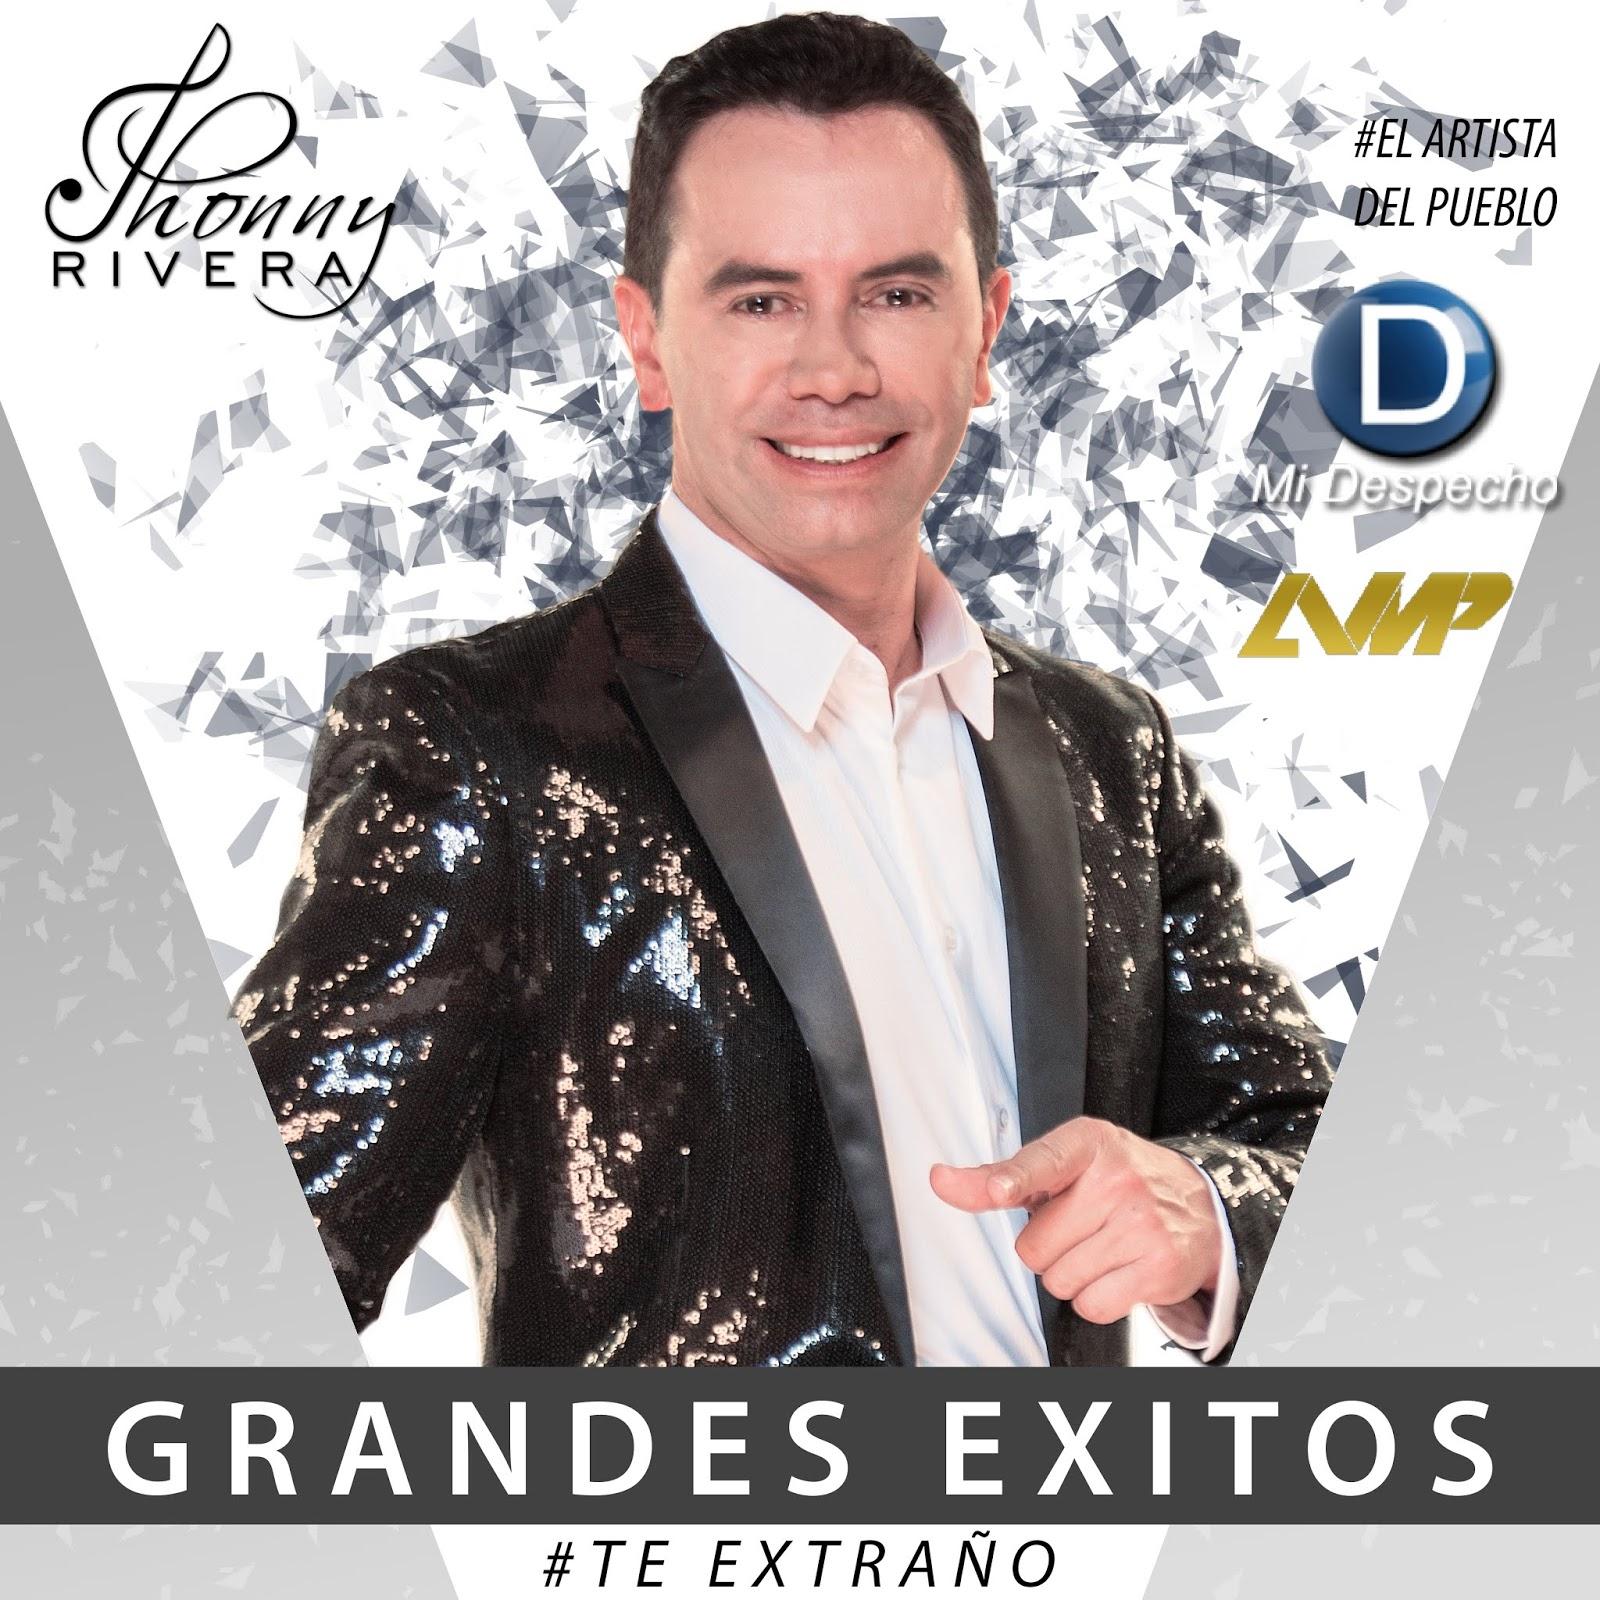 Jhonny Rivera Grandes Éxitos Frontal